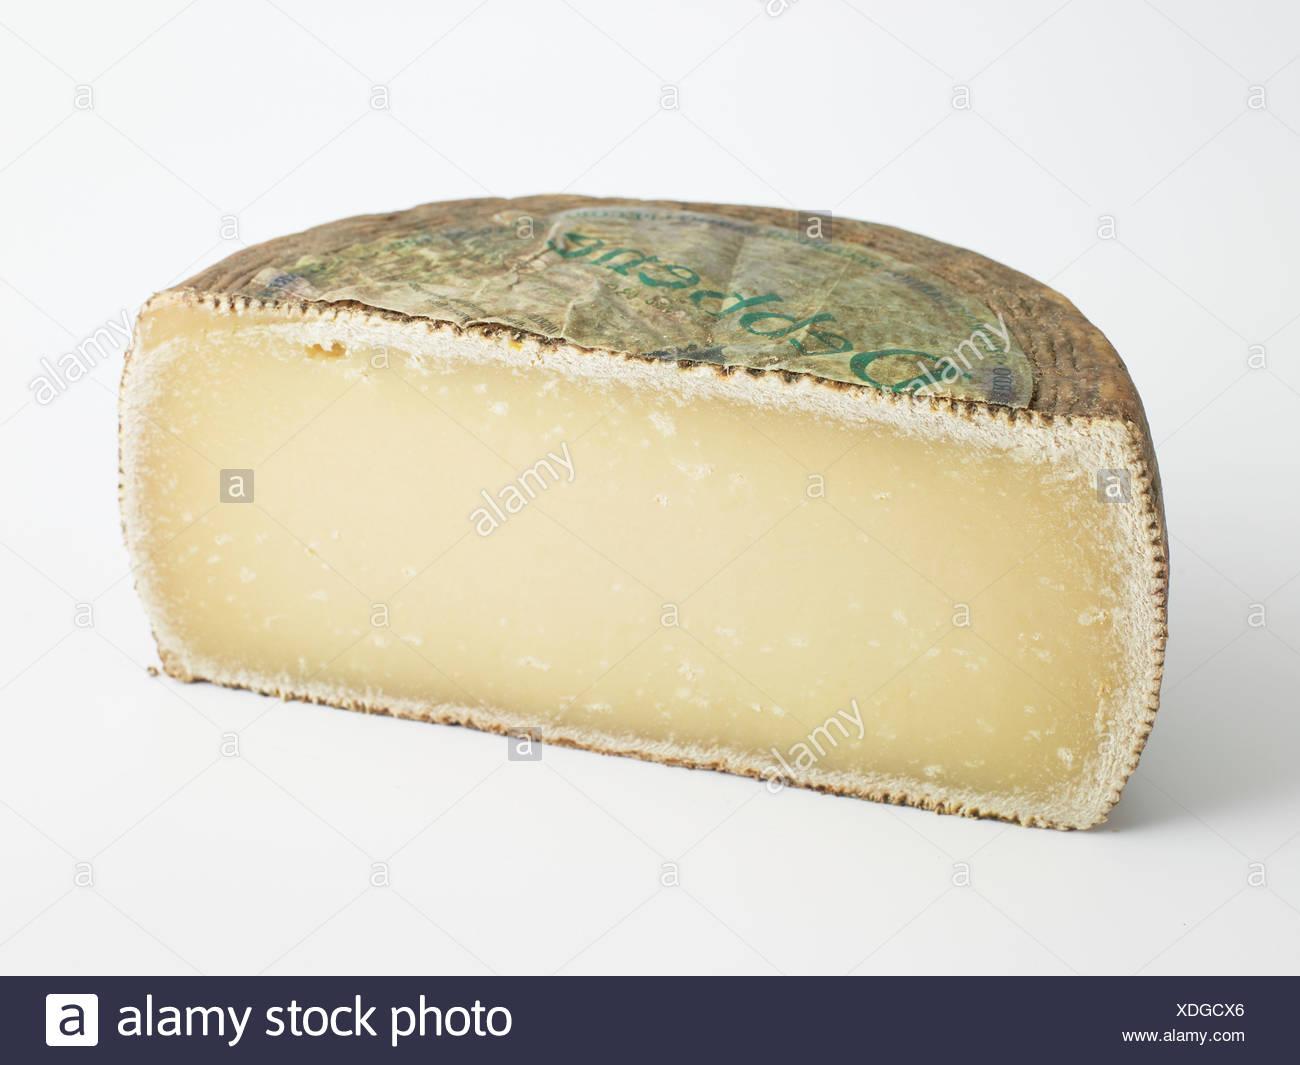 Italian Pecorino Sardo ewe's milk cheese, close-up - Stock Image